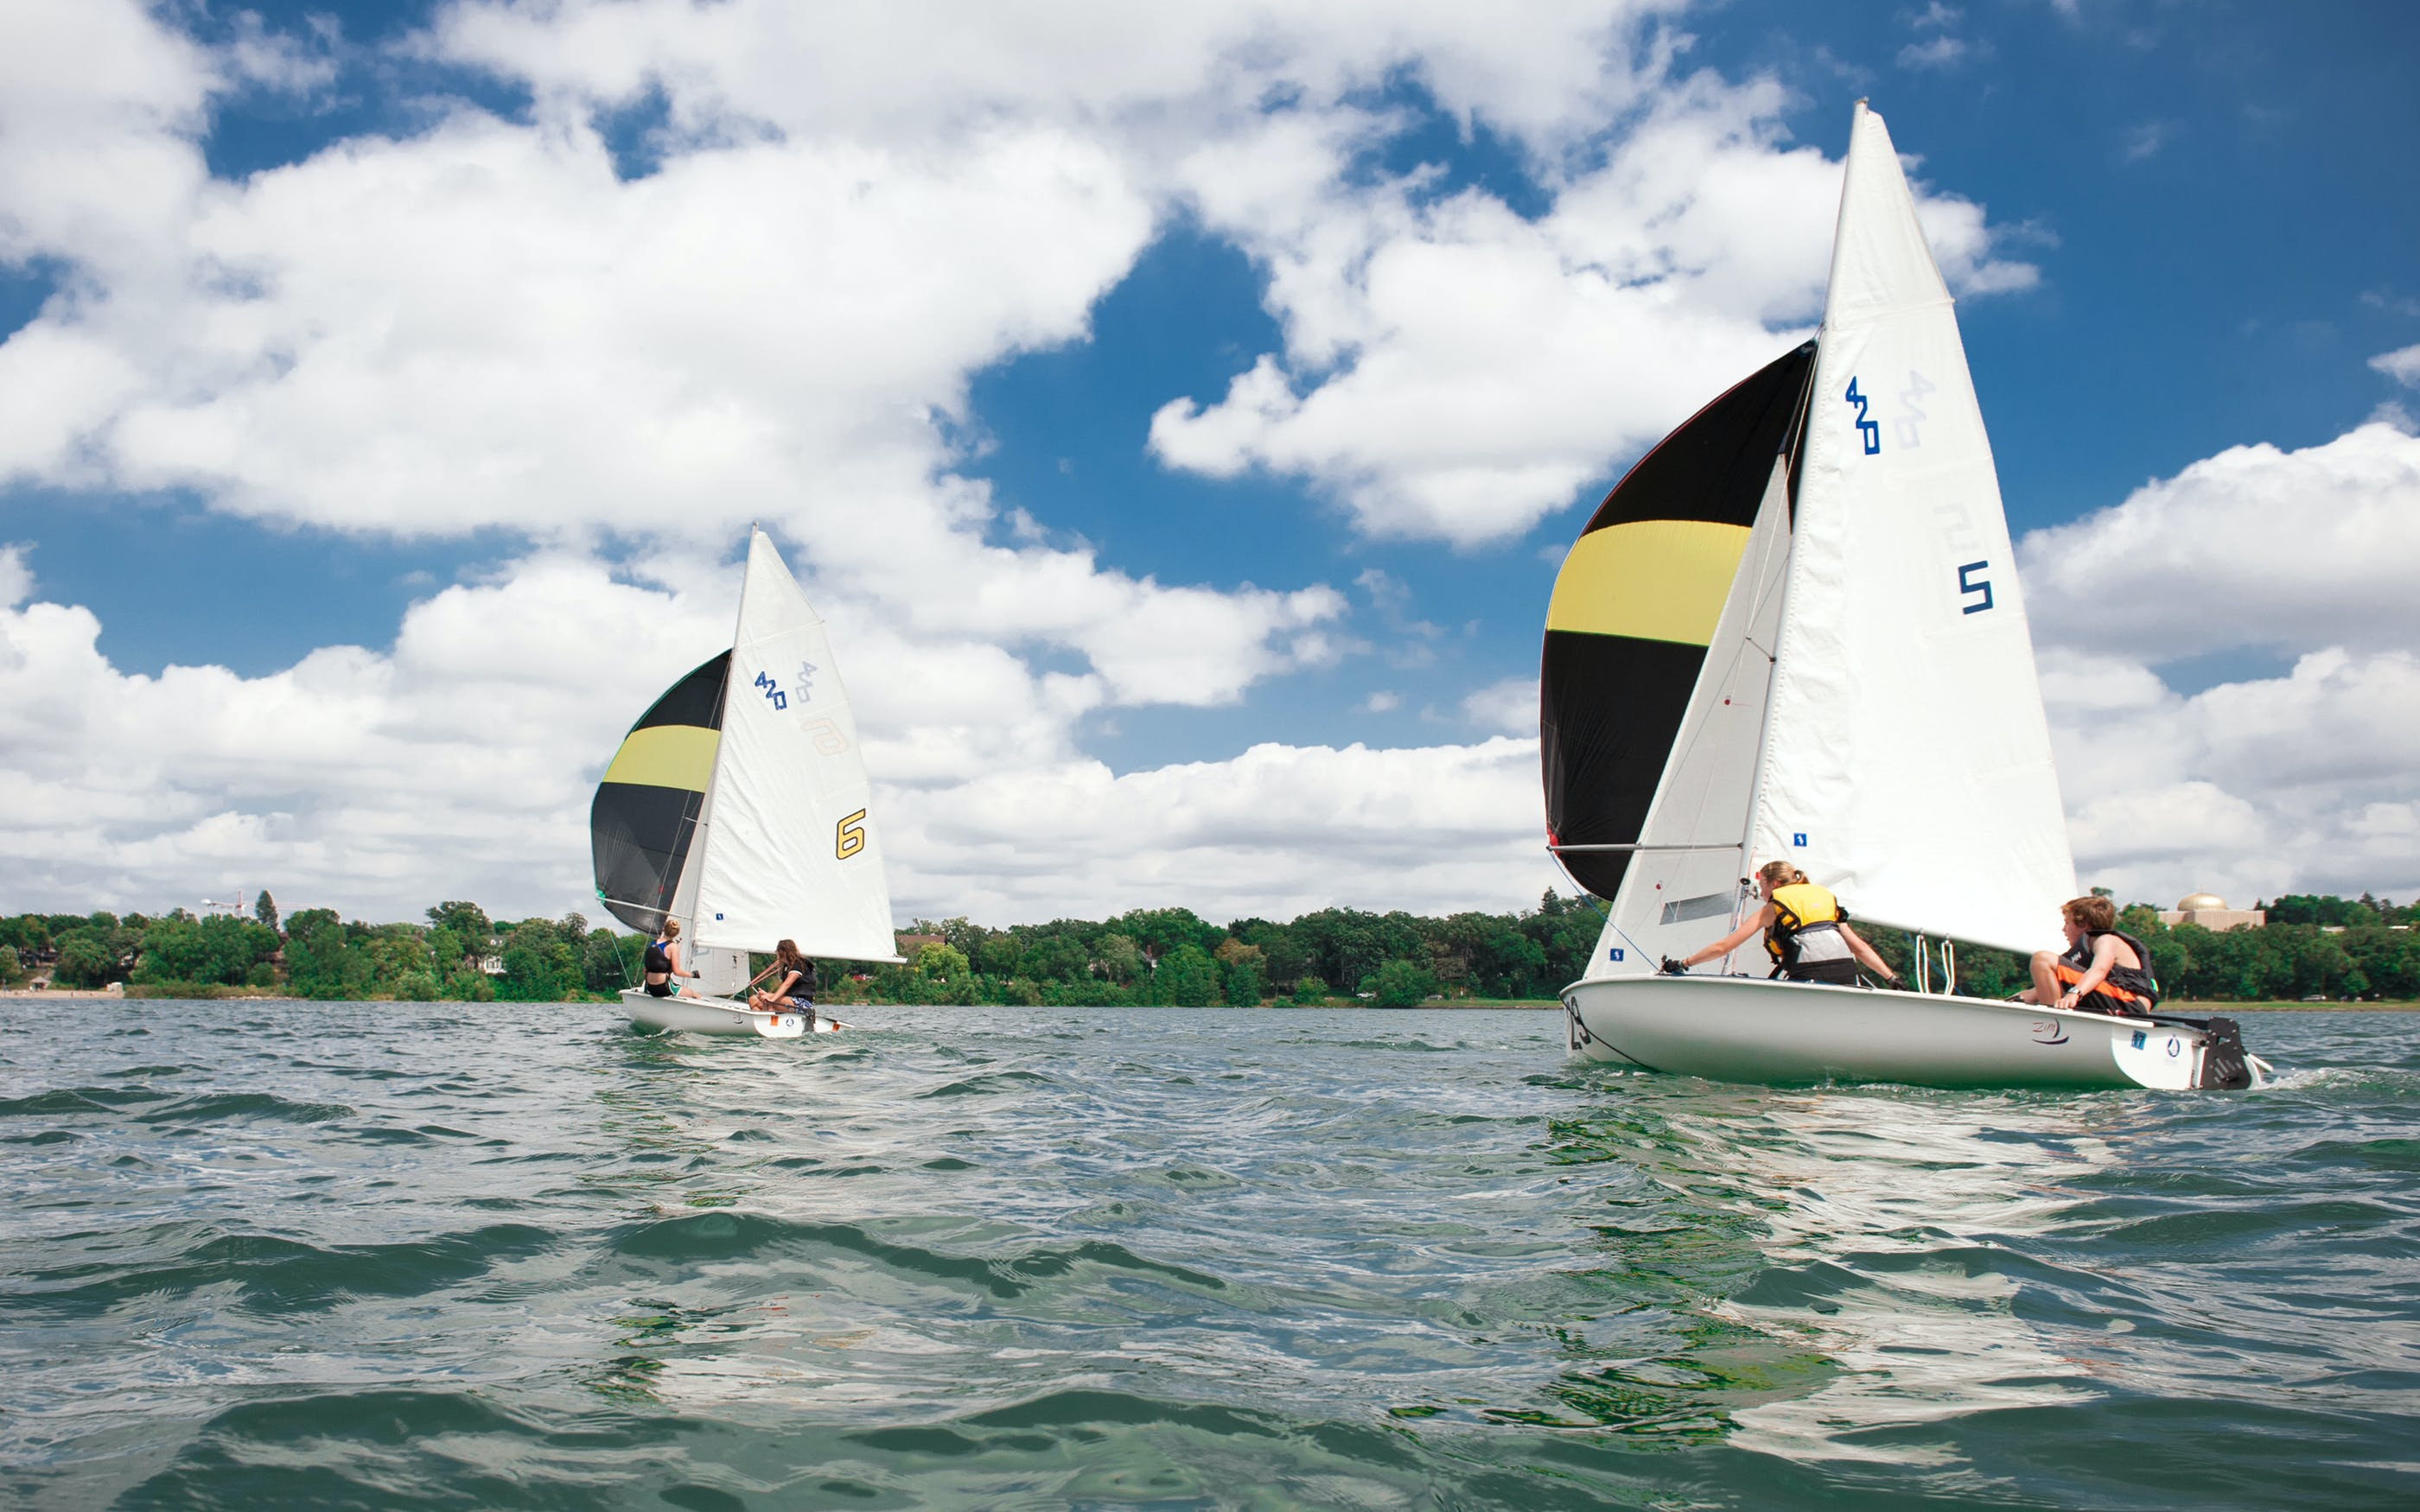 Contemporaries Daniel Buren Sail Boat Race